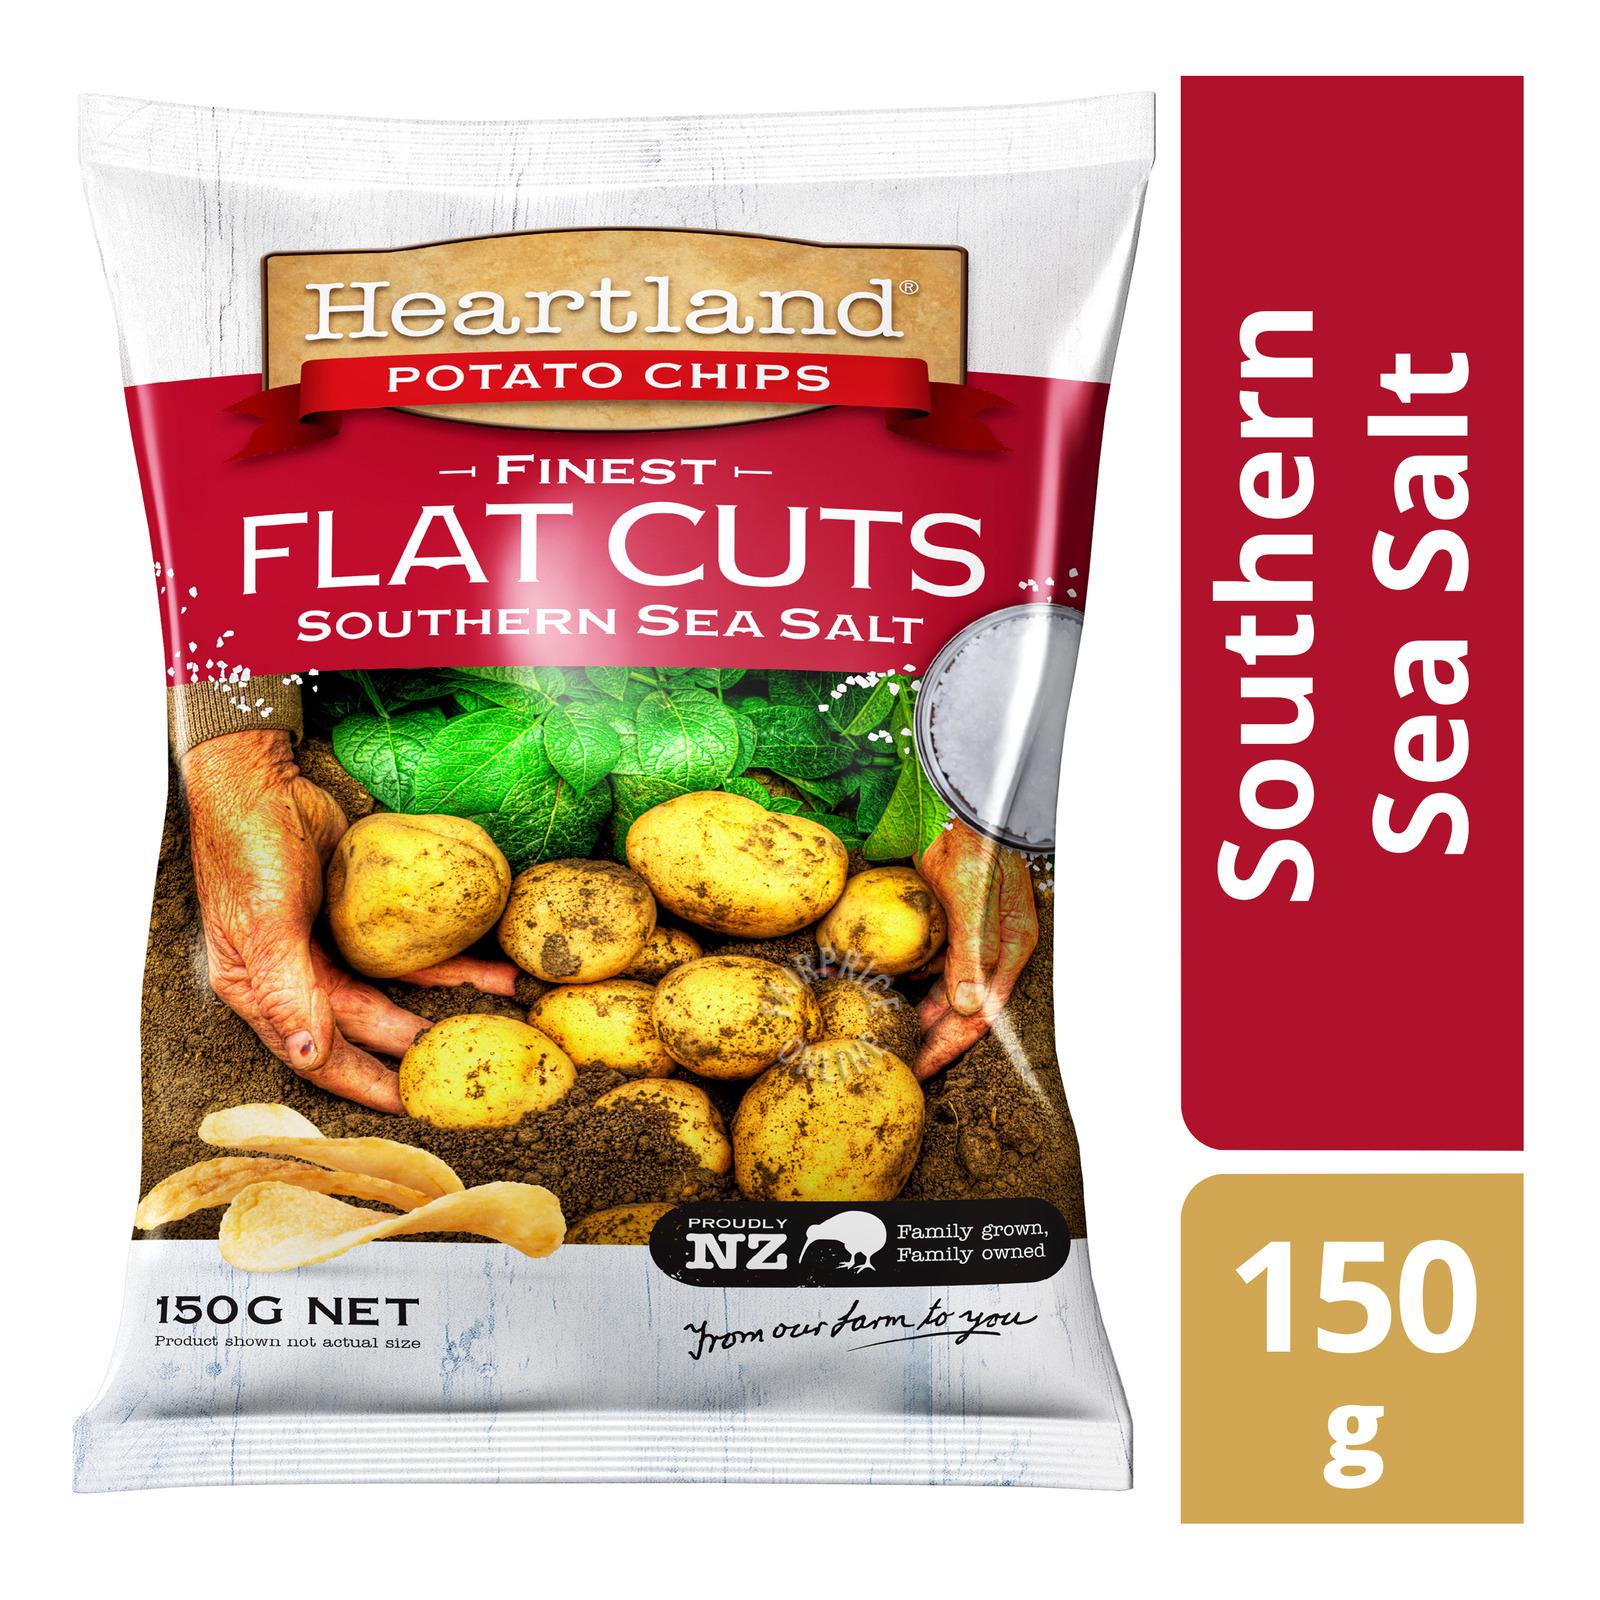 Heartland Flat Cuts Potato Chips - Southern Sea Salt